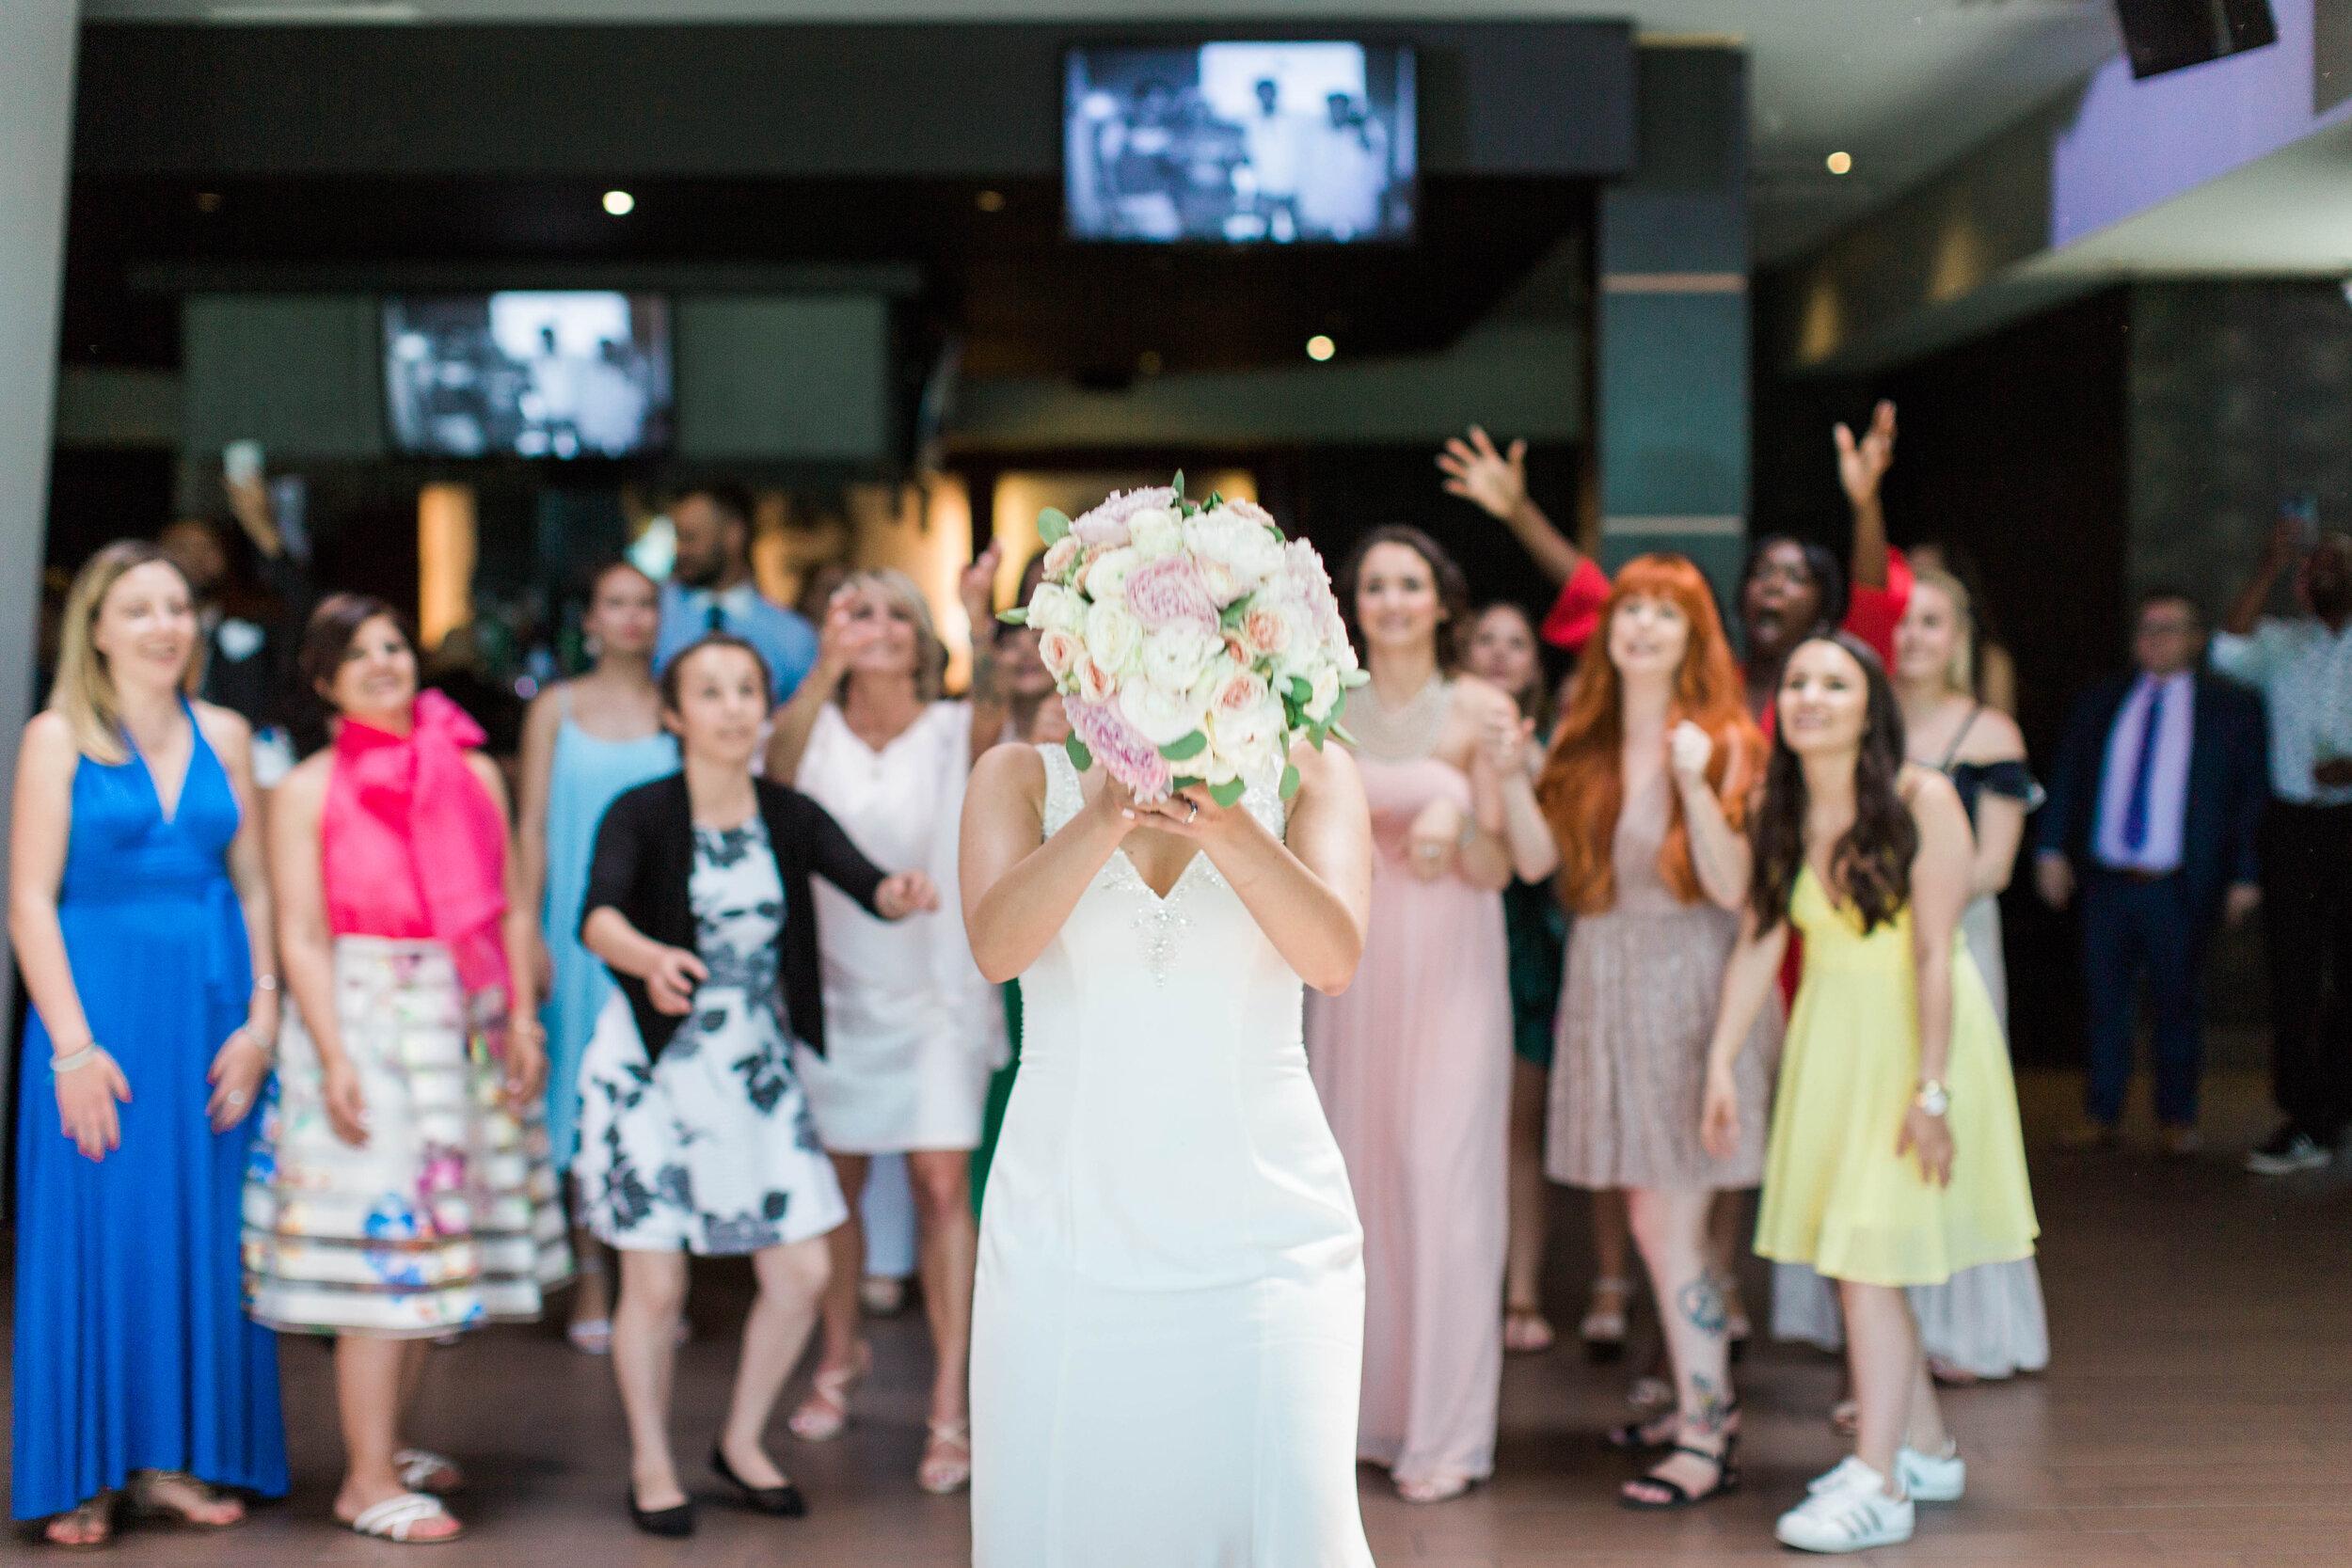 Bridal Bouquet Toss - Trendy Modern Brunch Wedding - Historia Wedding and Event Planning